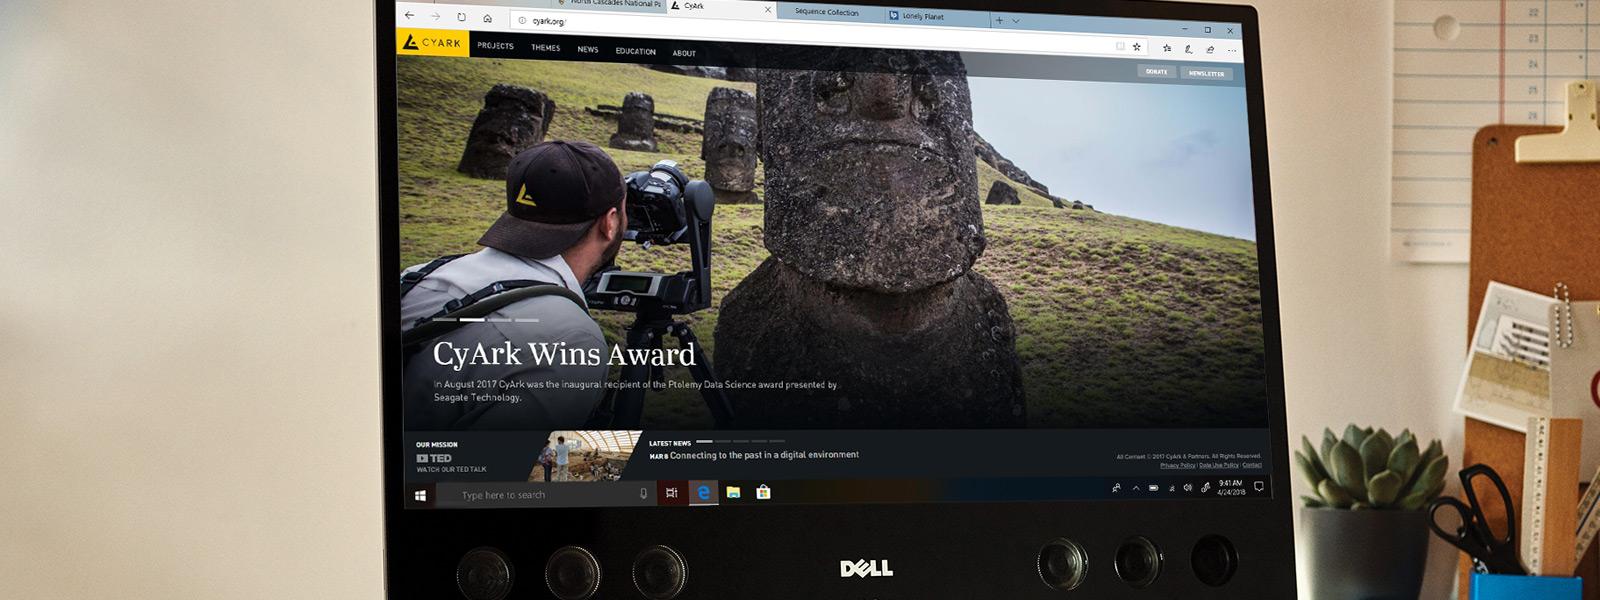 4K Ultra HD 비디오가 표시된 Microsoft Edge 브라우저가 실행 중인 상태로 책상 위에 놓인 컴퓨터 모니터